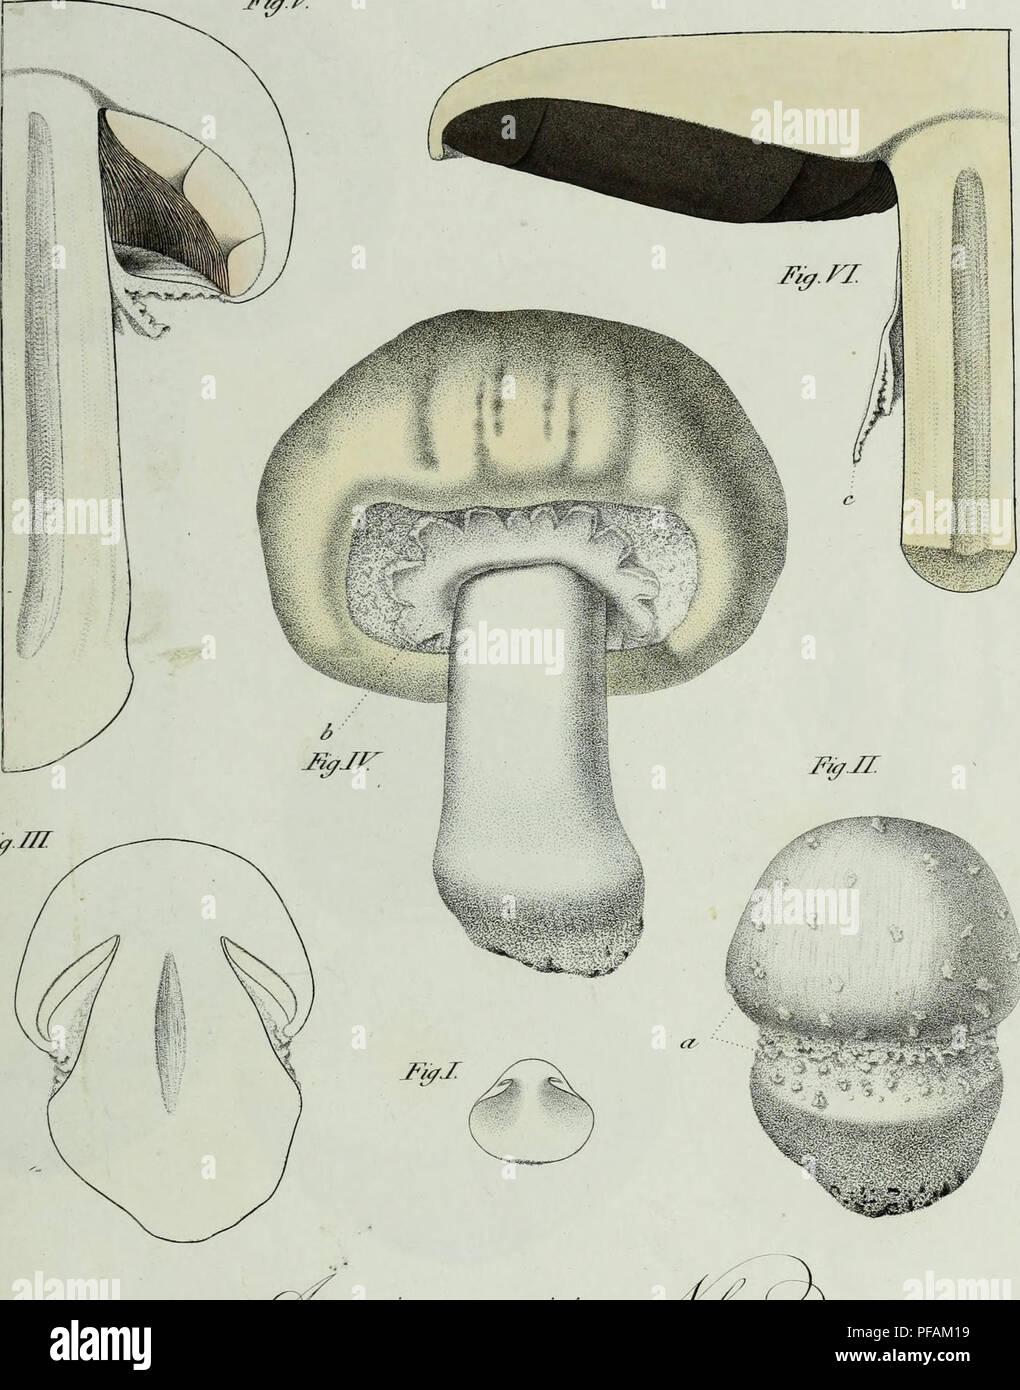 . Descrizione dei funghi mangerecci più comuni dell'Italia e de' velenosi che possono co' medesimi confondersi. Fungi; Mushrooms. 1 T.xmi. jr&jr. FìyJTI QJ-' (3a a rie*/.' eauT/UtJ^faj t_ '<?v â f^ìrttziijti* r.2- n&t&rei. Please note that these images are extracted from scanned page images that may have been digitally enhanced for readability - coloration and appearance of these illustrations may not perfectly resemble the original work.. Vittadini, Carlo; Cavagna Sangiuliani di Gualdana, Antonio, conte, 1843-1913, former owner. IU-R. Milano, Rusconi - Stock Image